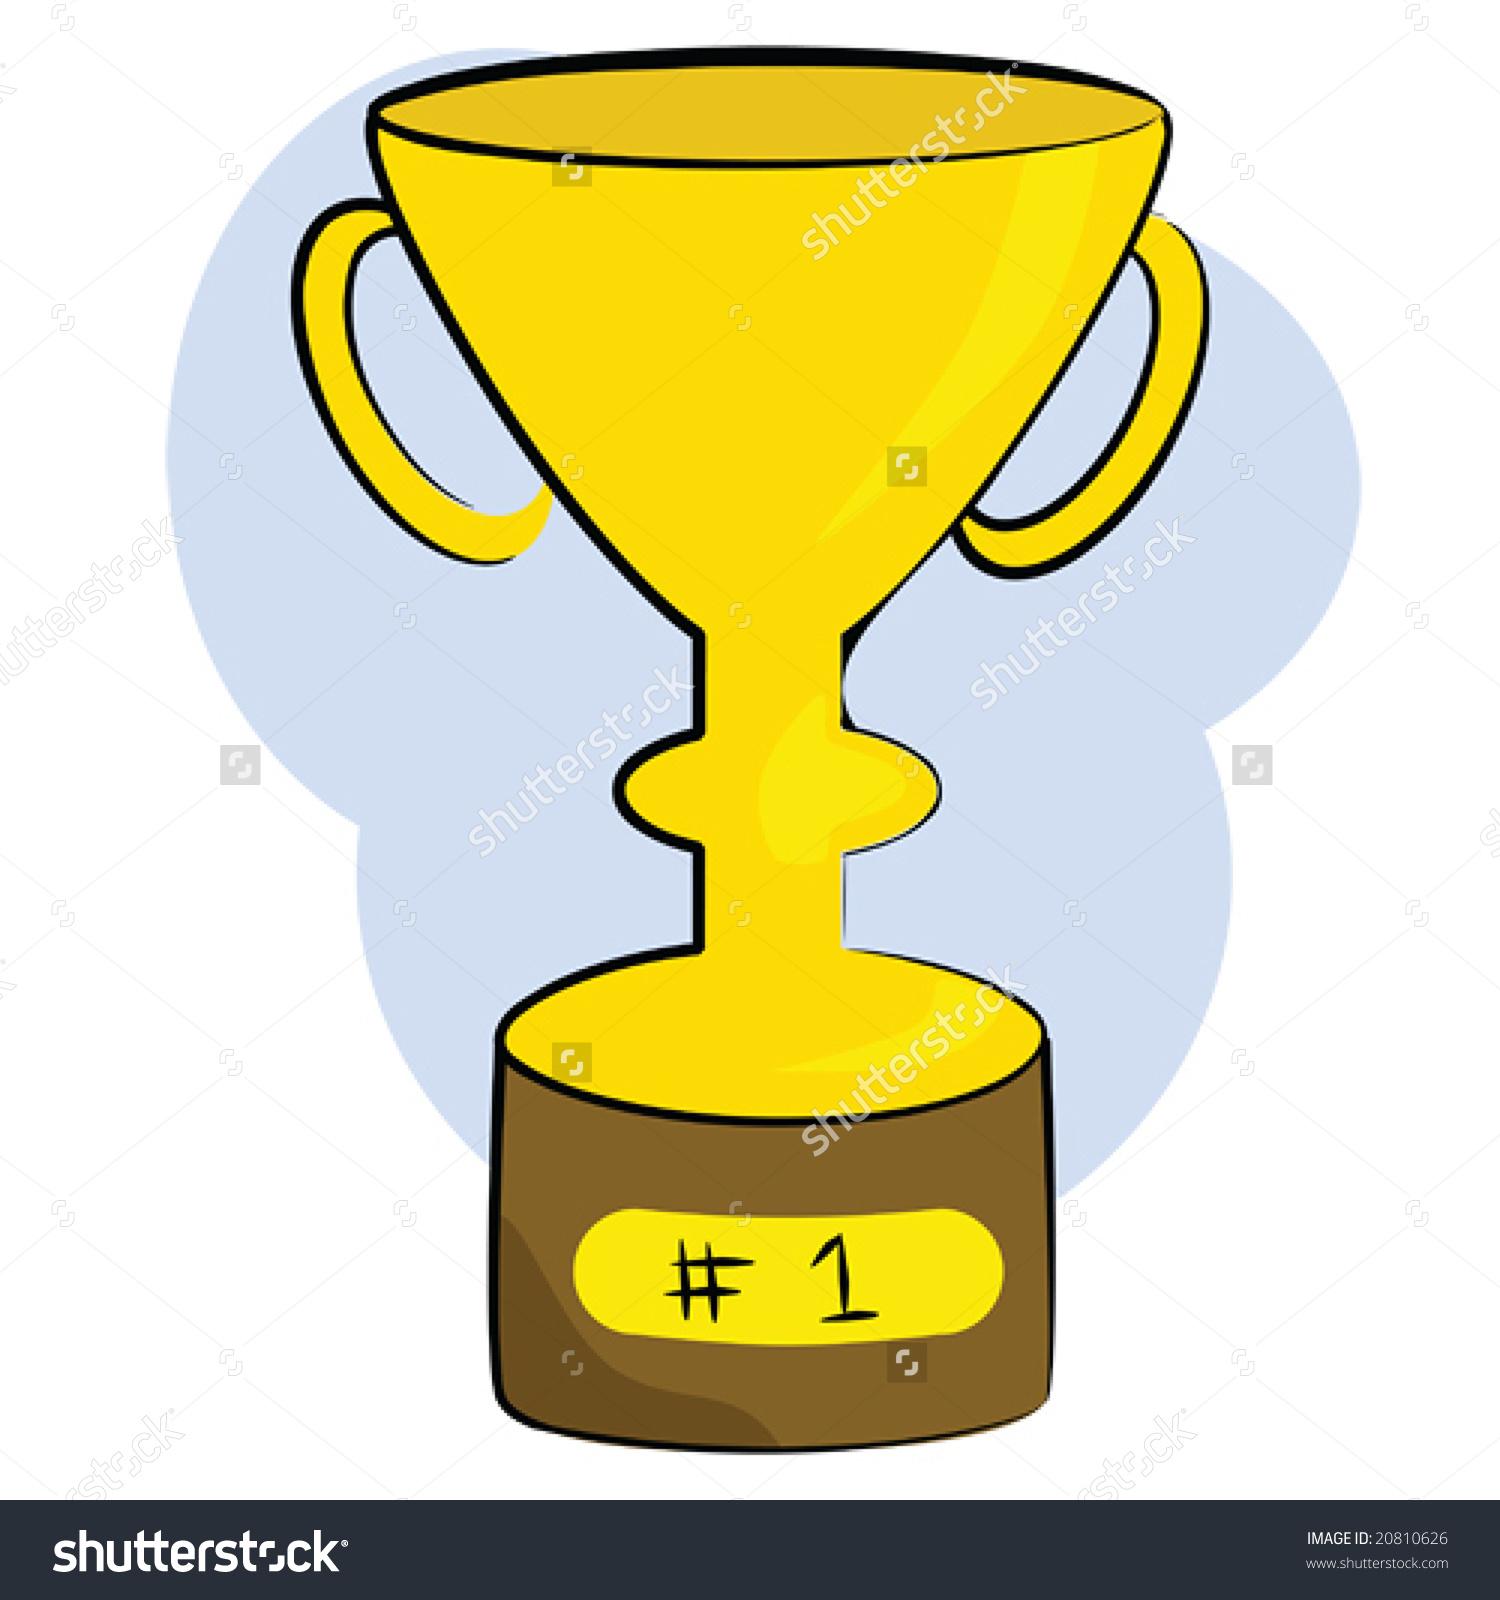 Cartoon Vector Illustration Golden Trophy Mounted Stock Vector.